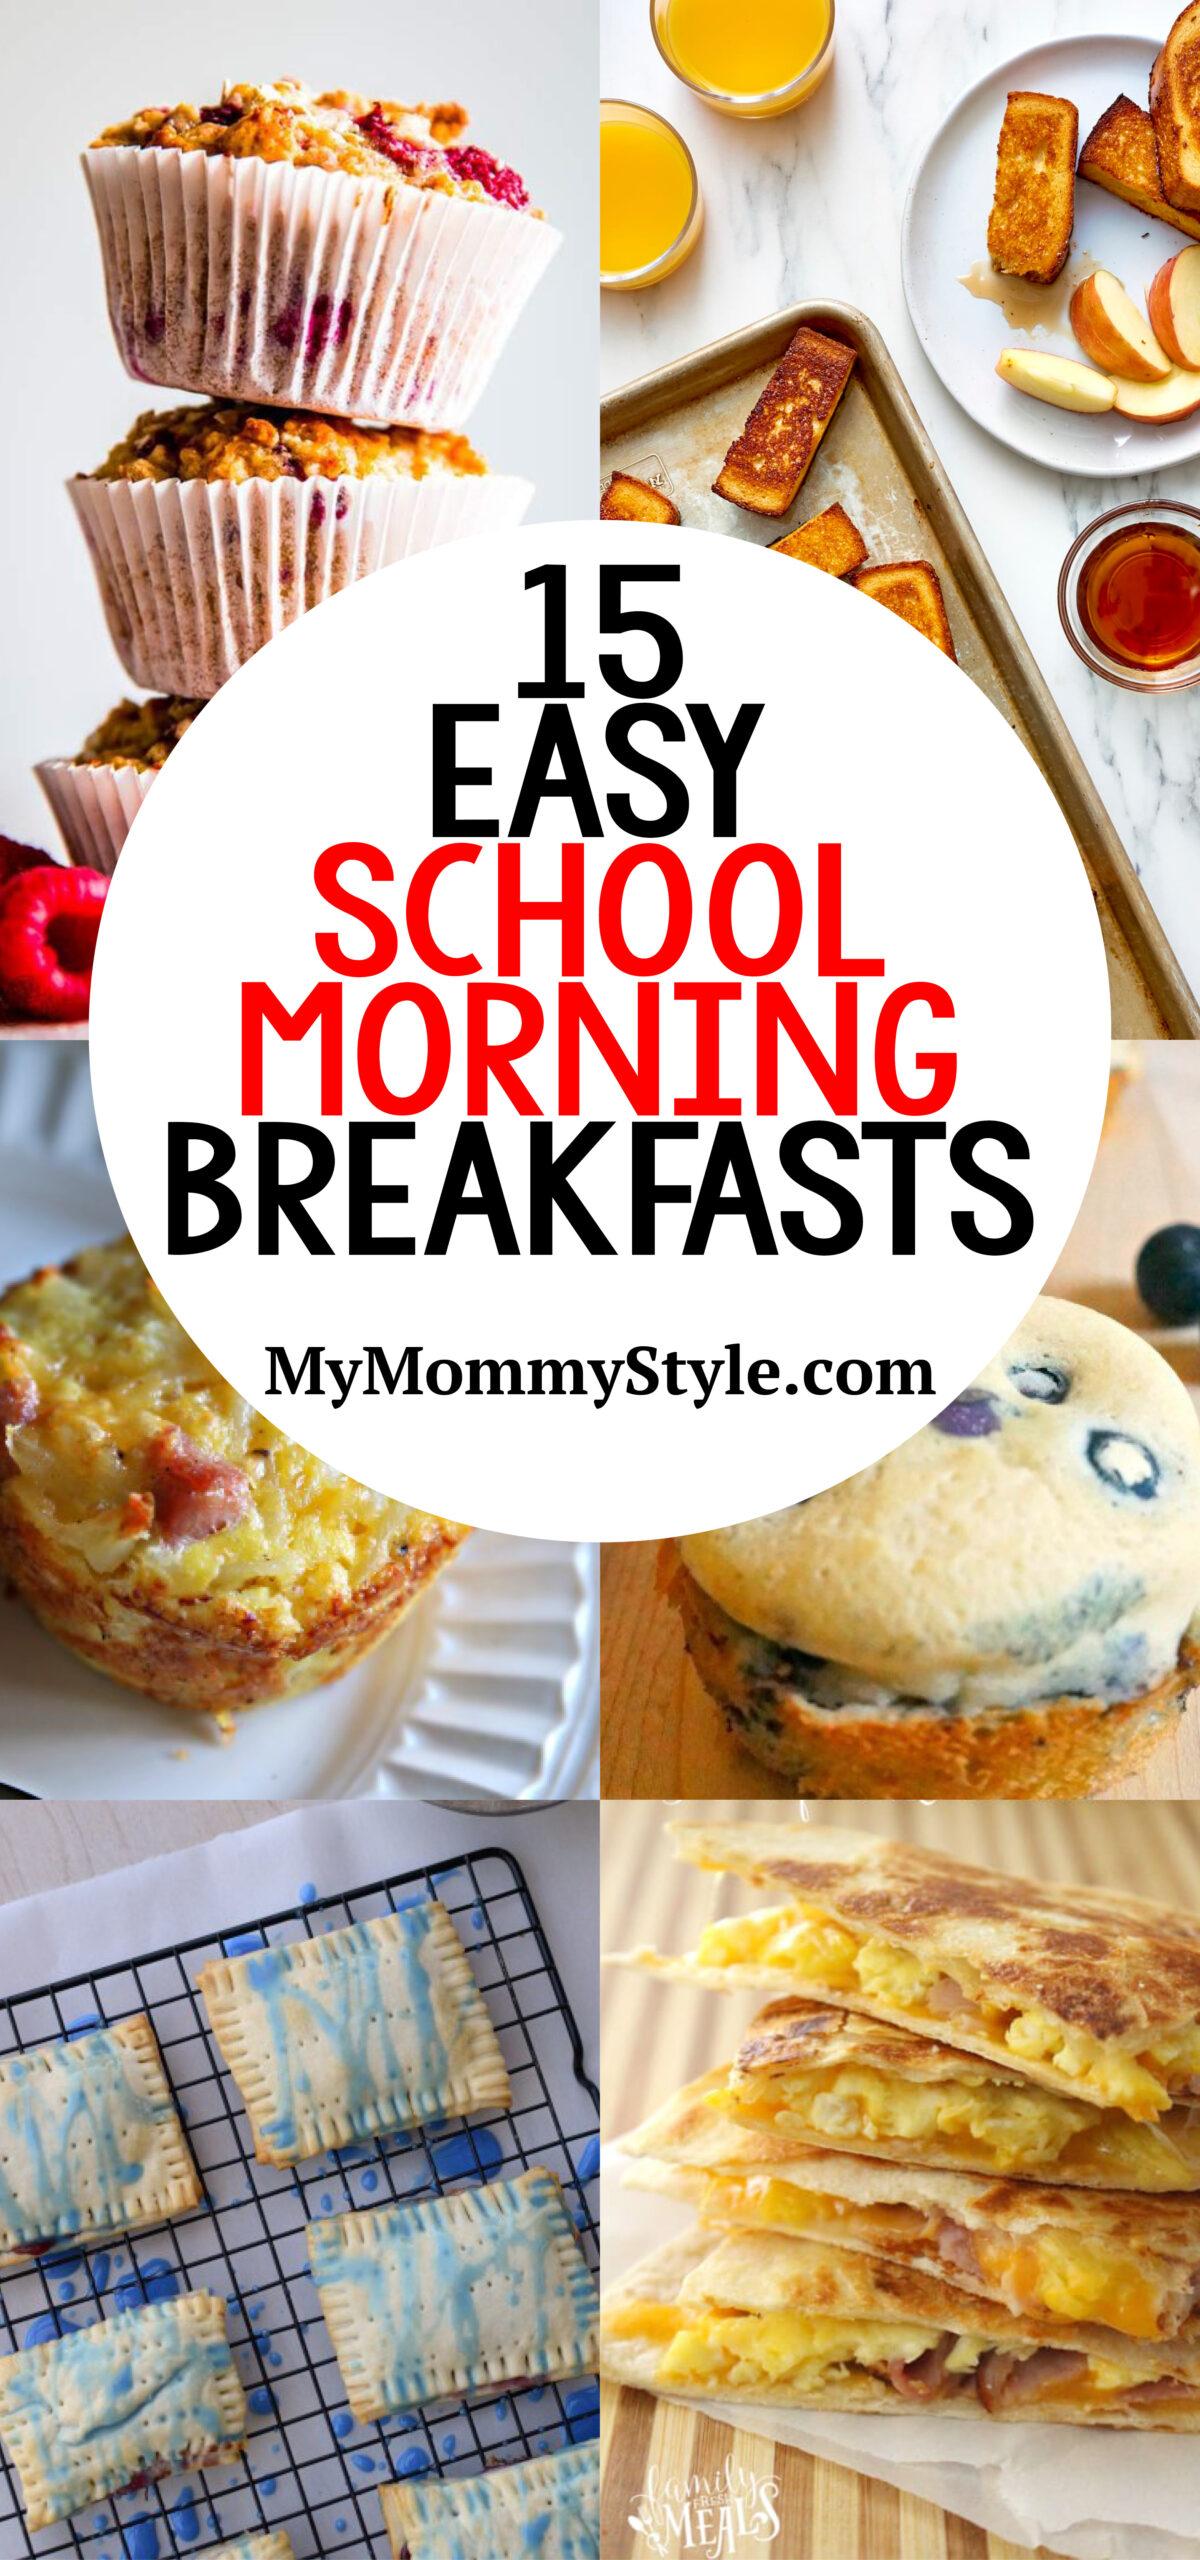 easy school morning breakfast ideas via @mymommystyle